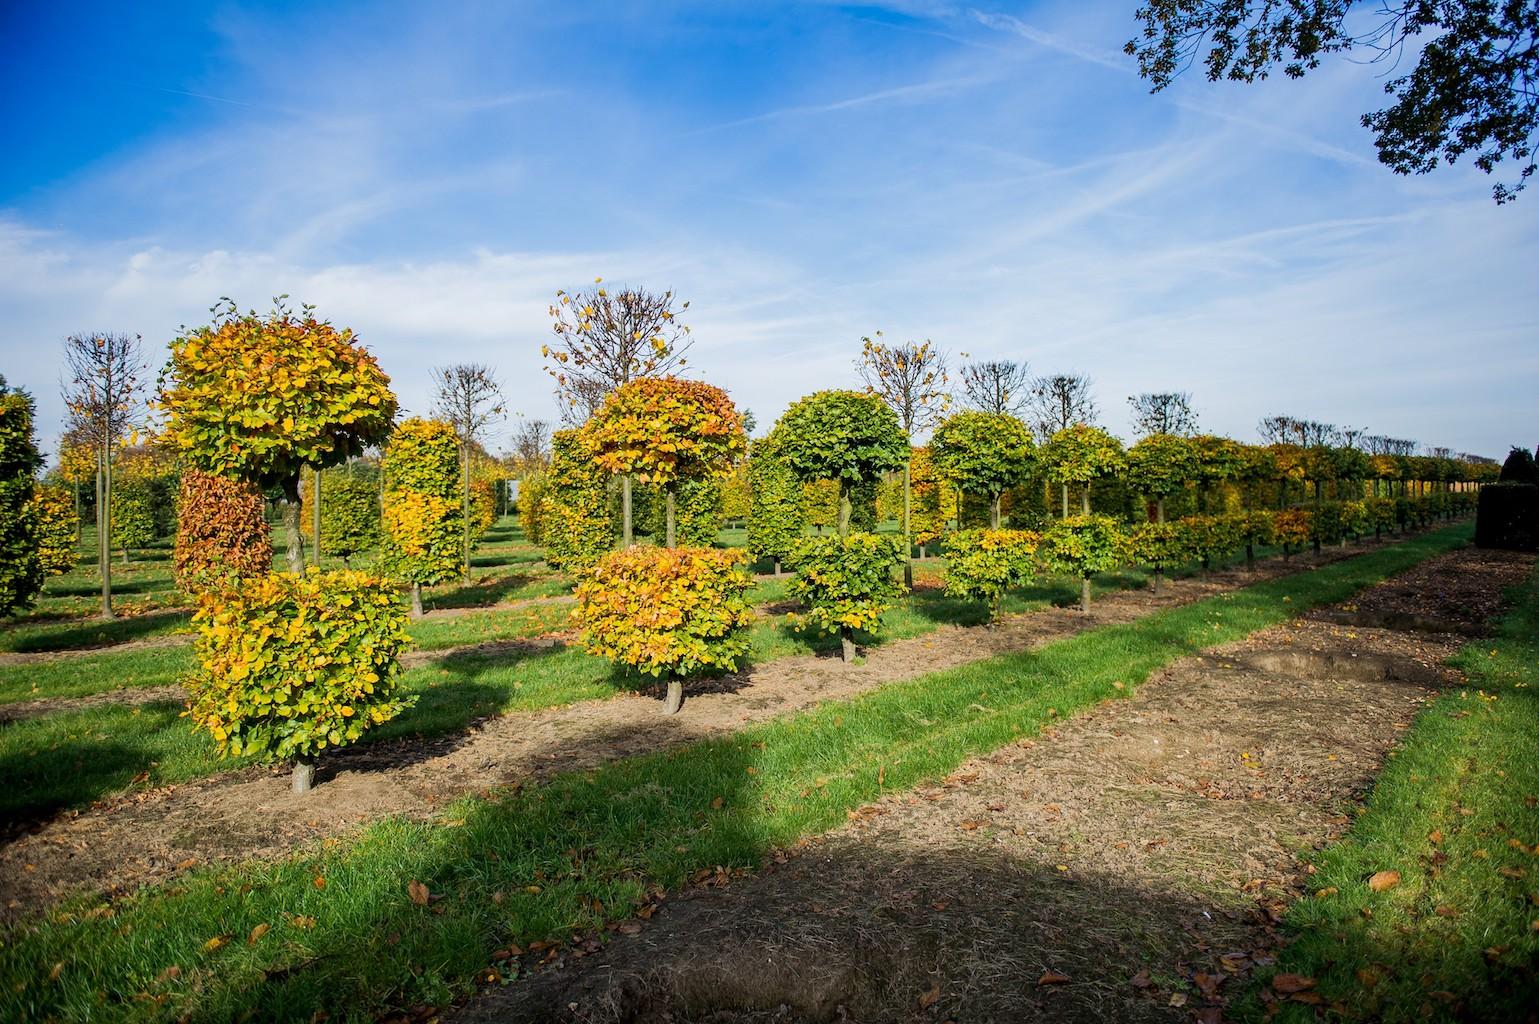 Fagus sylvatica bespoke topiary Beech specimens